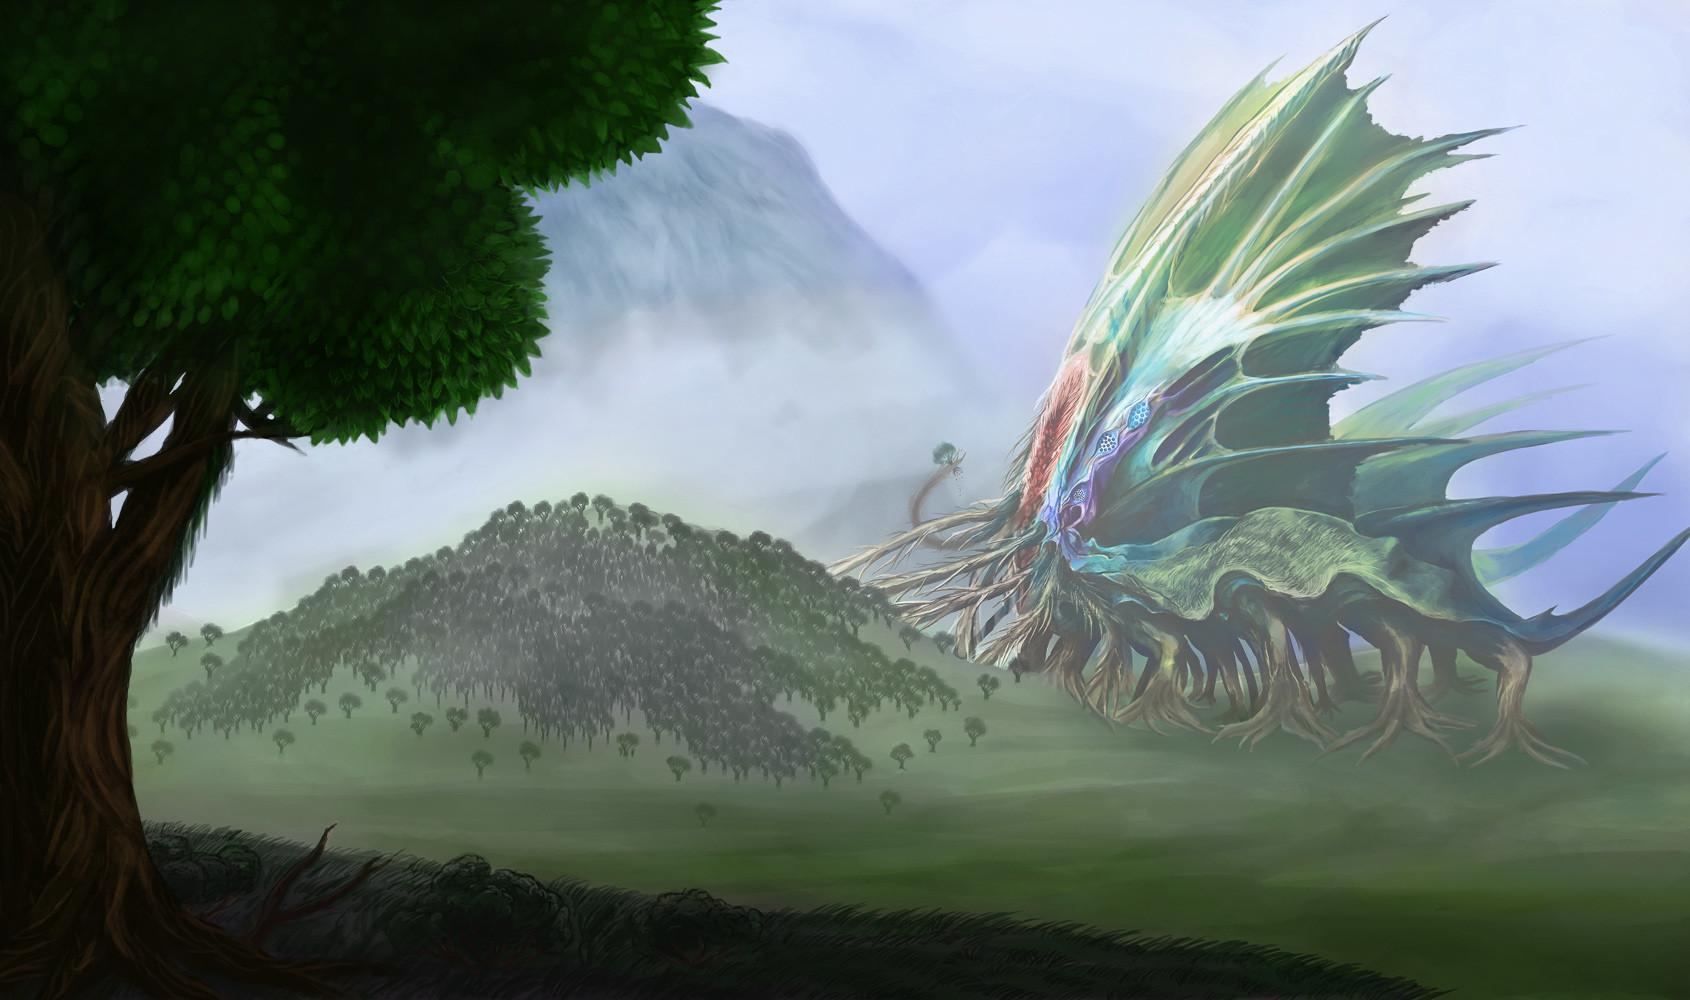 Orm irian giant tree devourer by catharina wendland